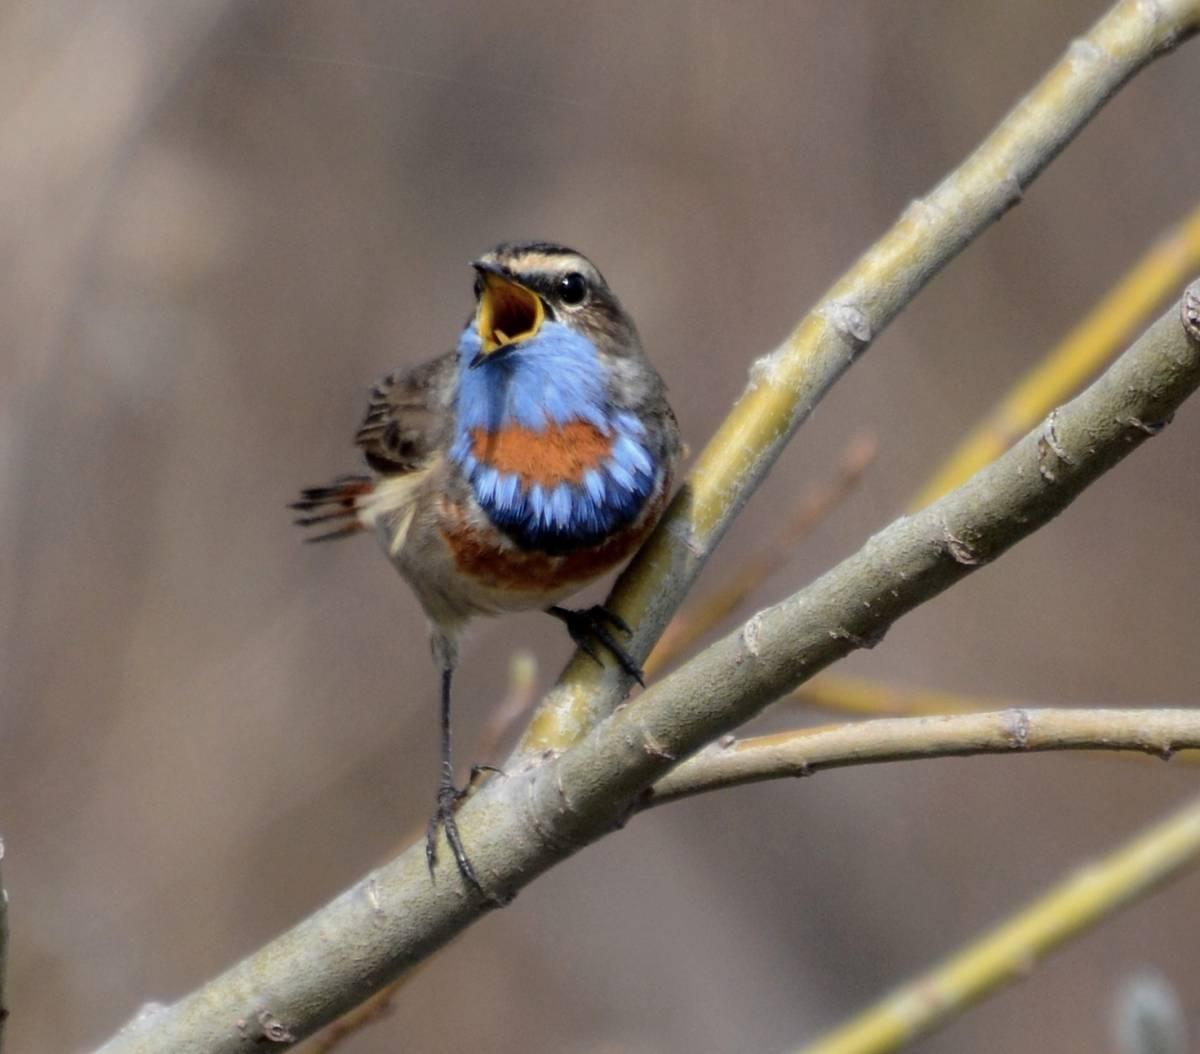 фото птиц с названиями в томской области нет желания постоянно